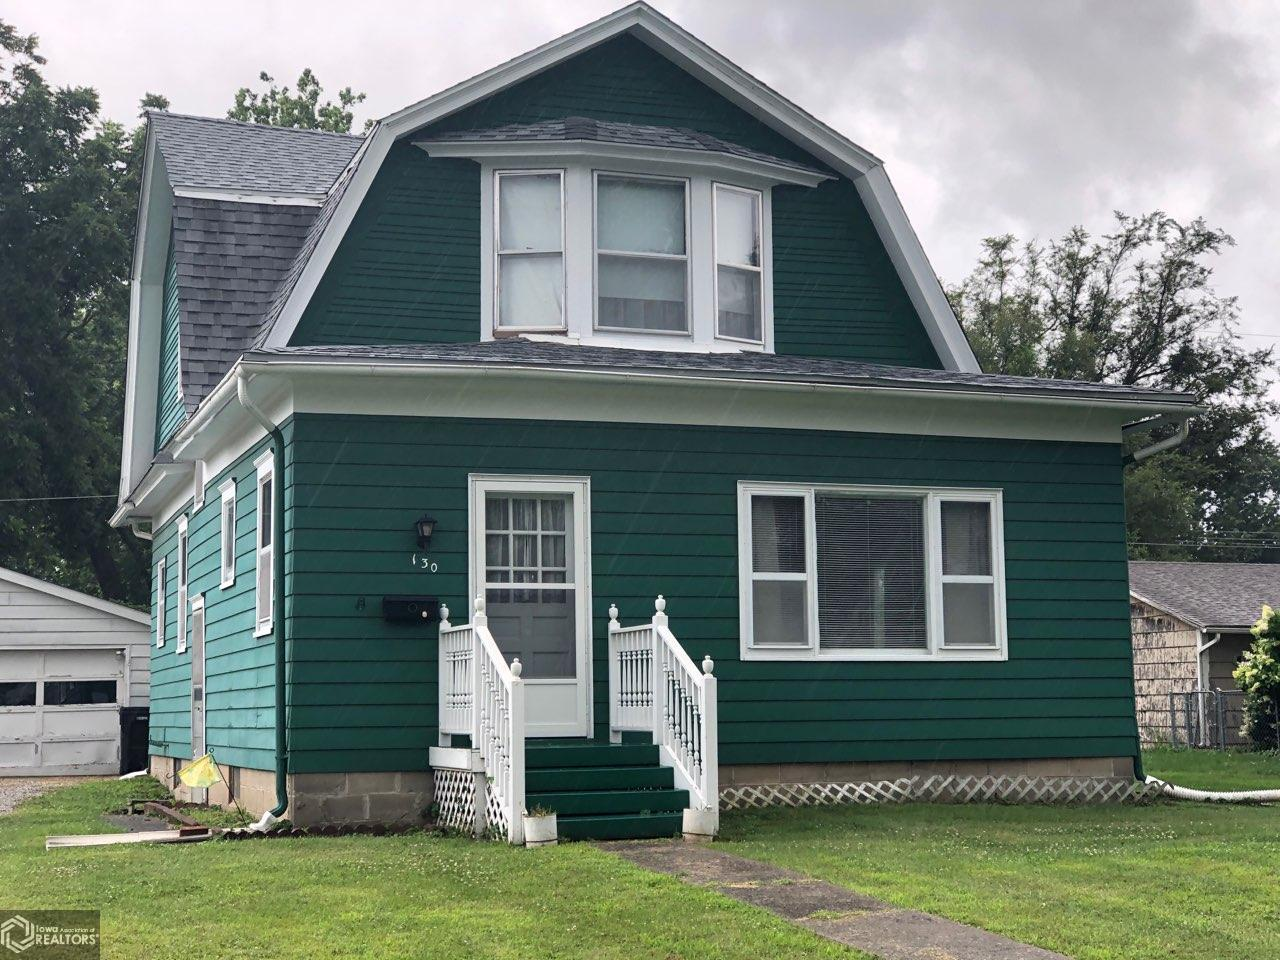 130 Hill Property Photo - Ottumwa, IA real estate listing